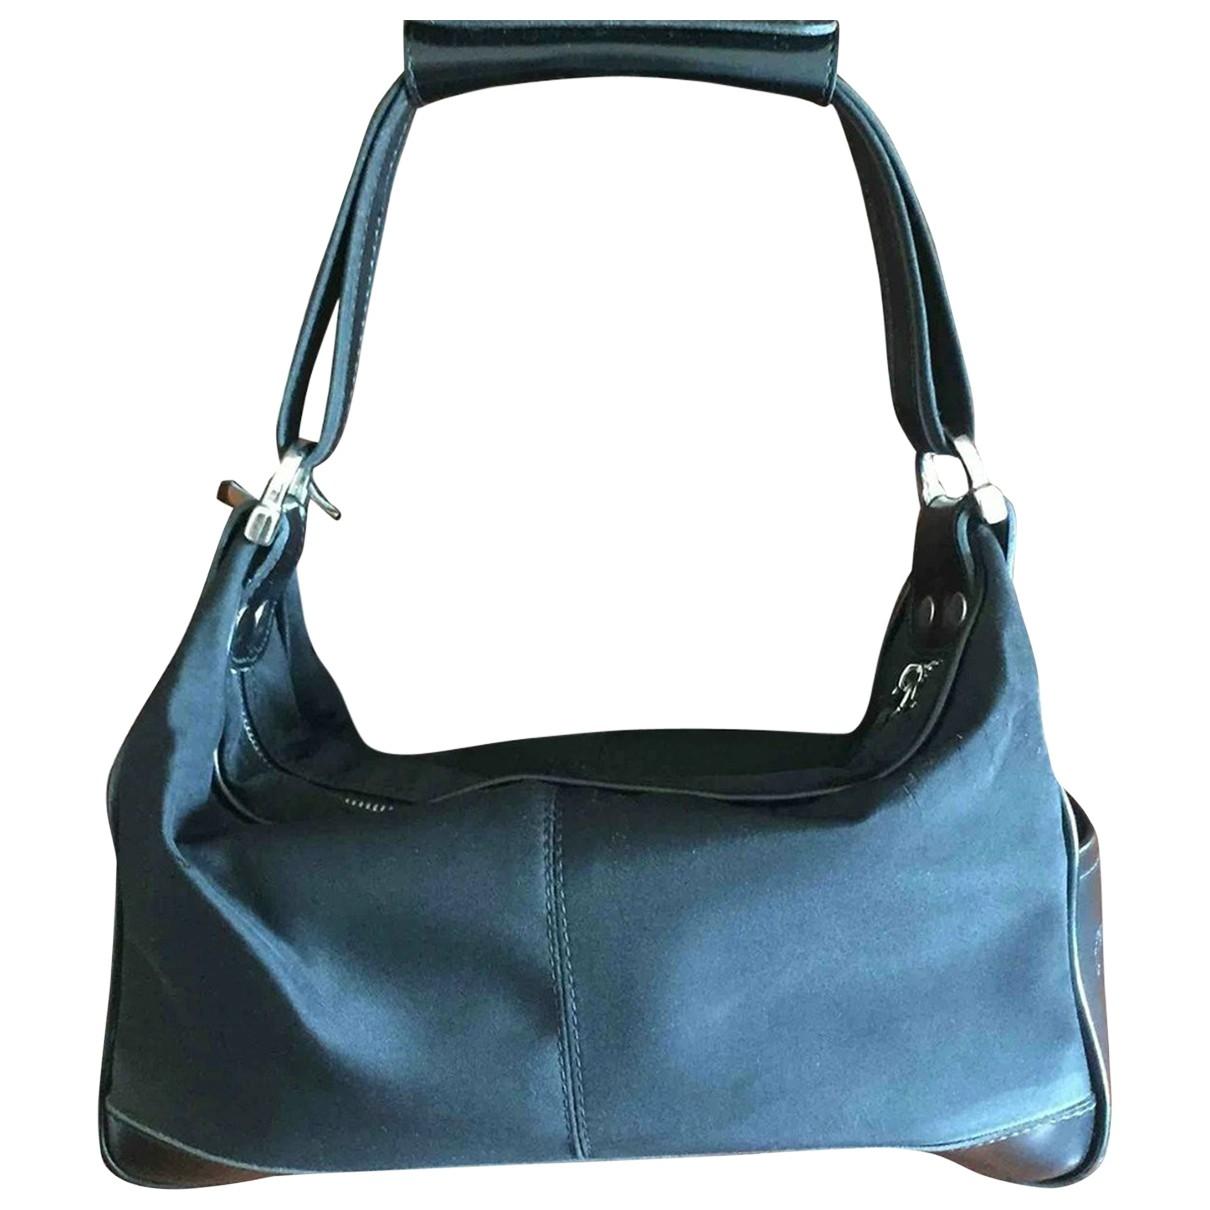 Tods \N Handtasche in  Schwarz Leinen